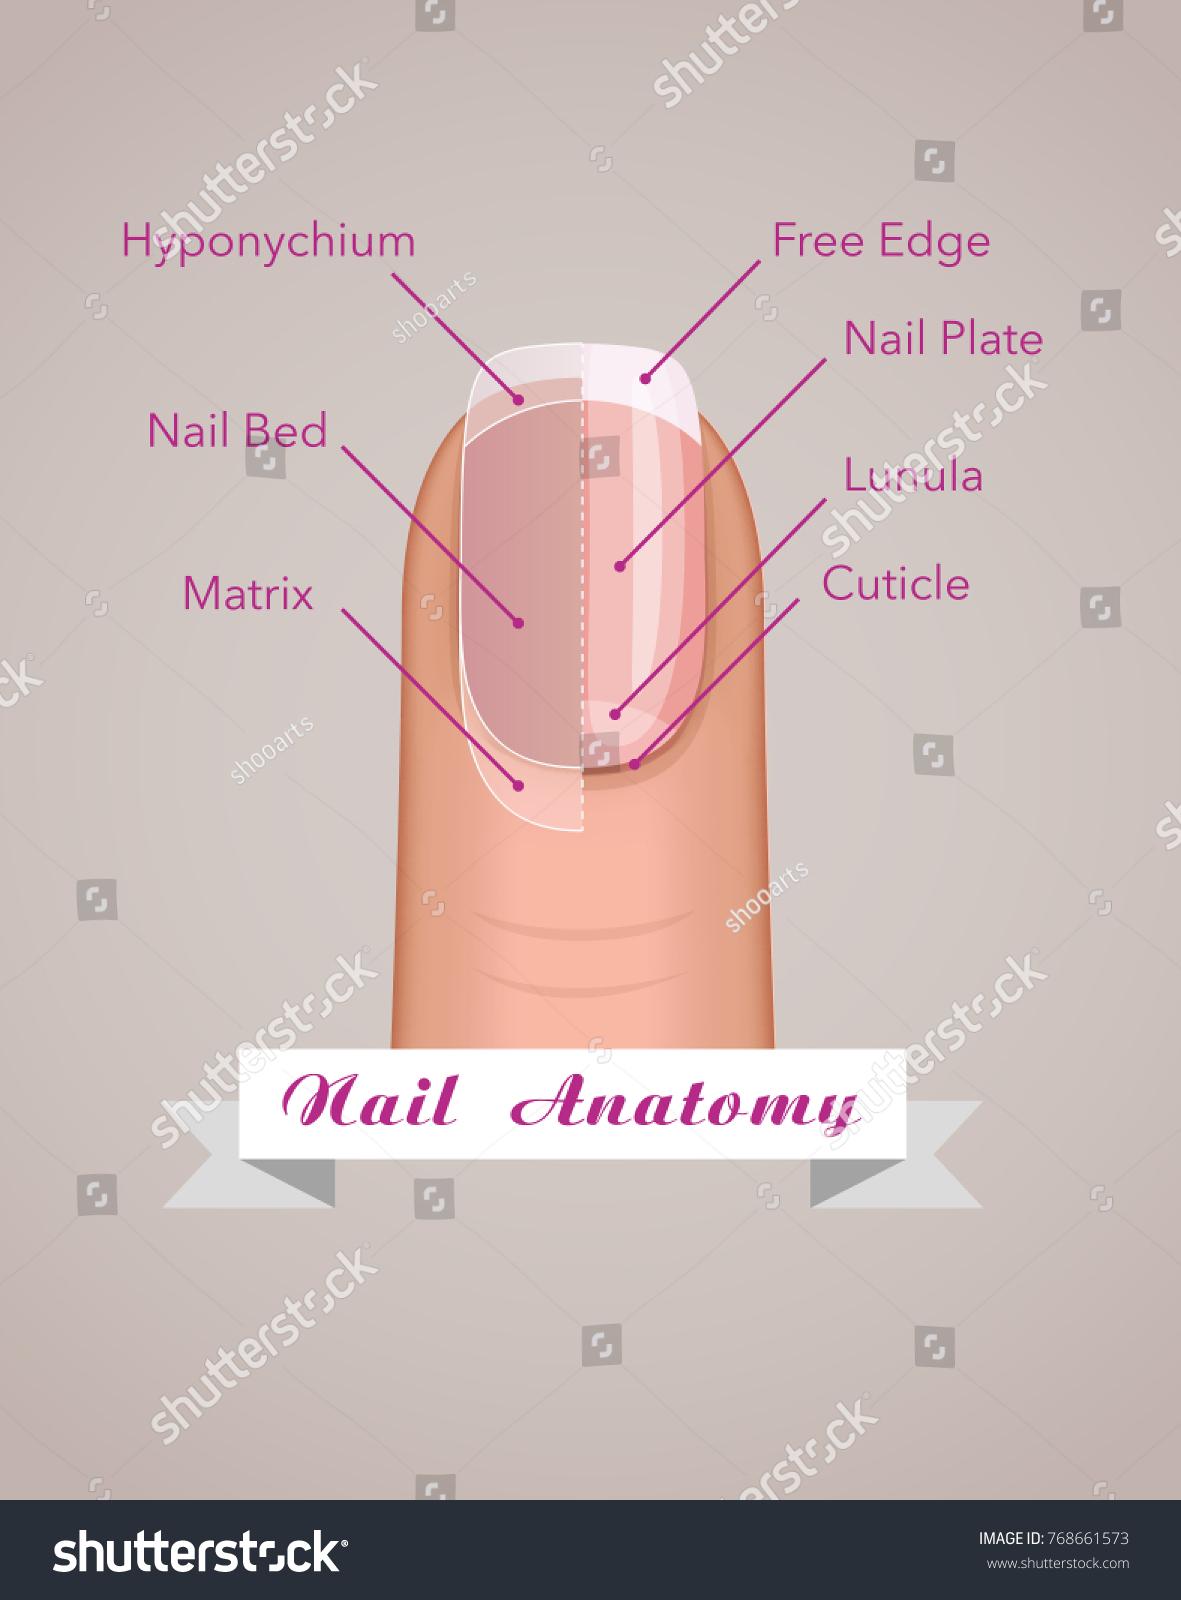 Structure Anatomy Human Nail Vector Stock Vector 768661573